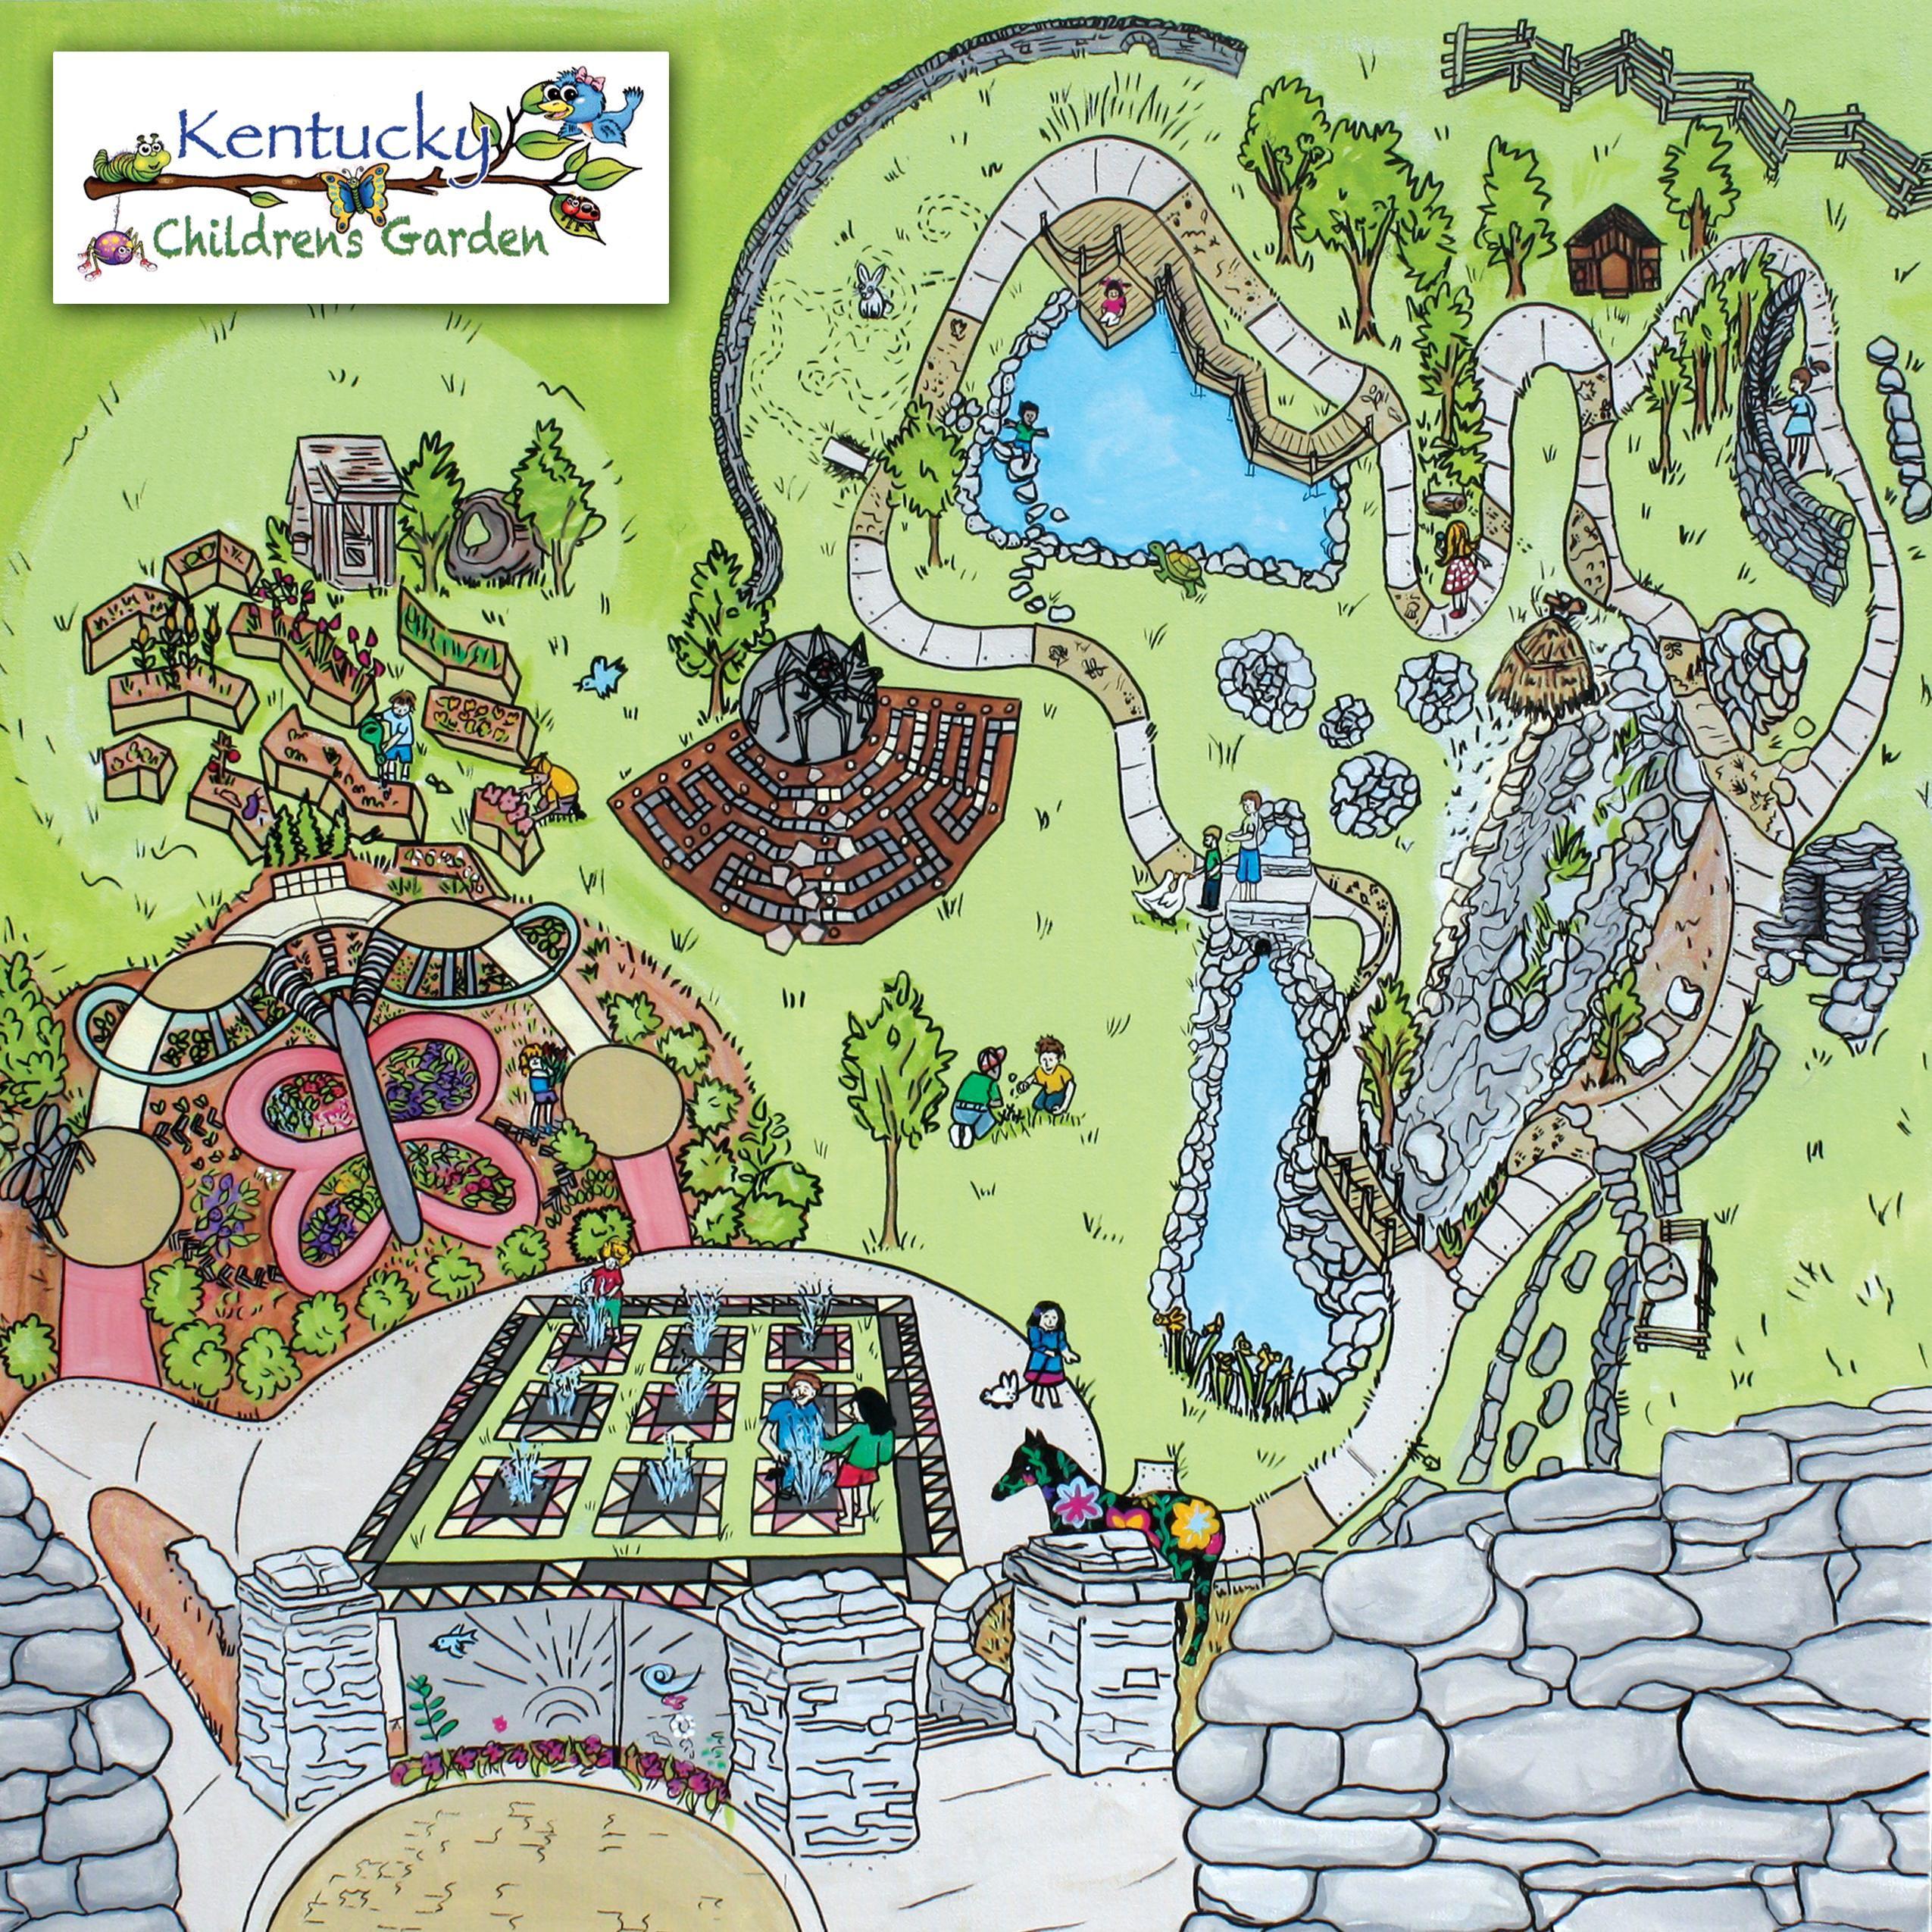 Arboretum Alumni Drive In Lexington Childrens Garden Map